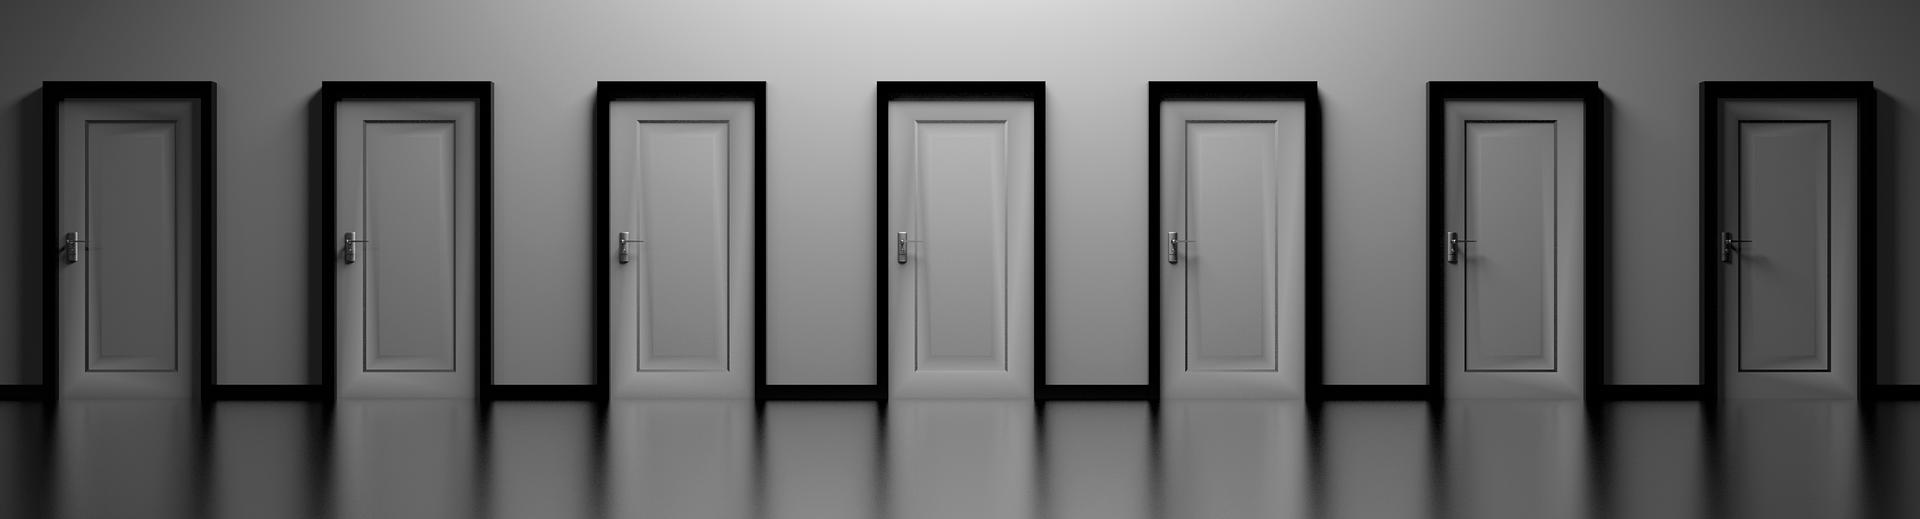 doors-1767564_1920_V2